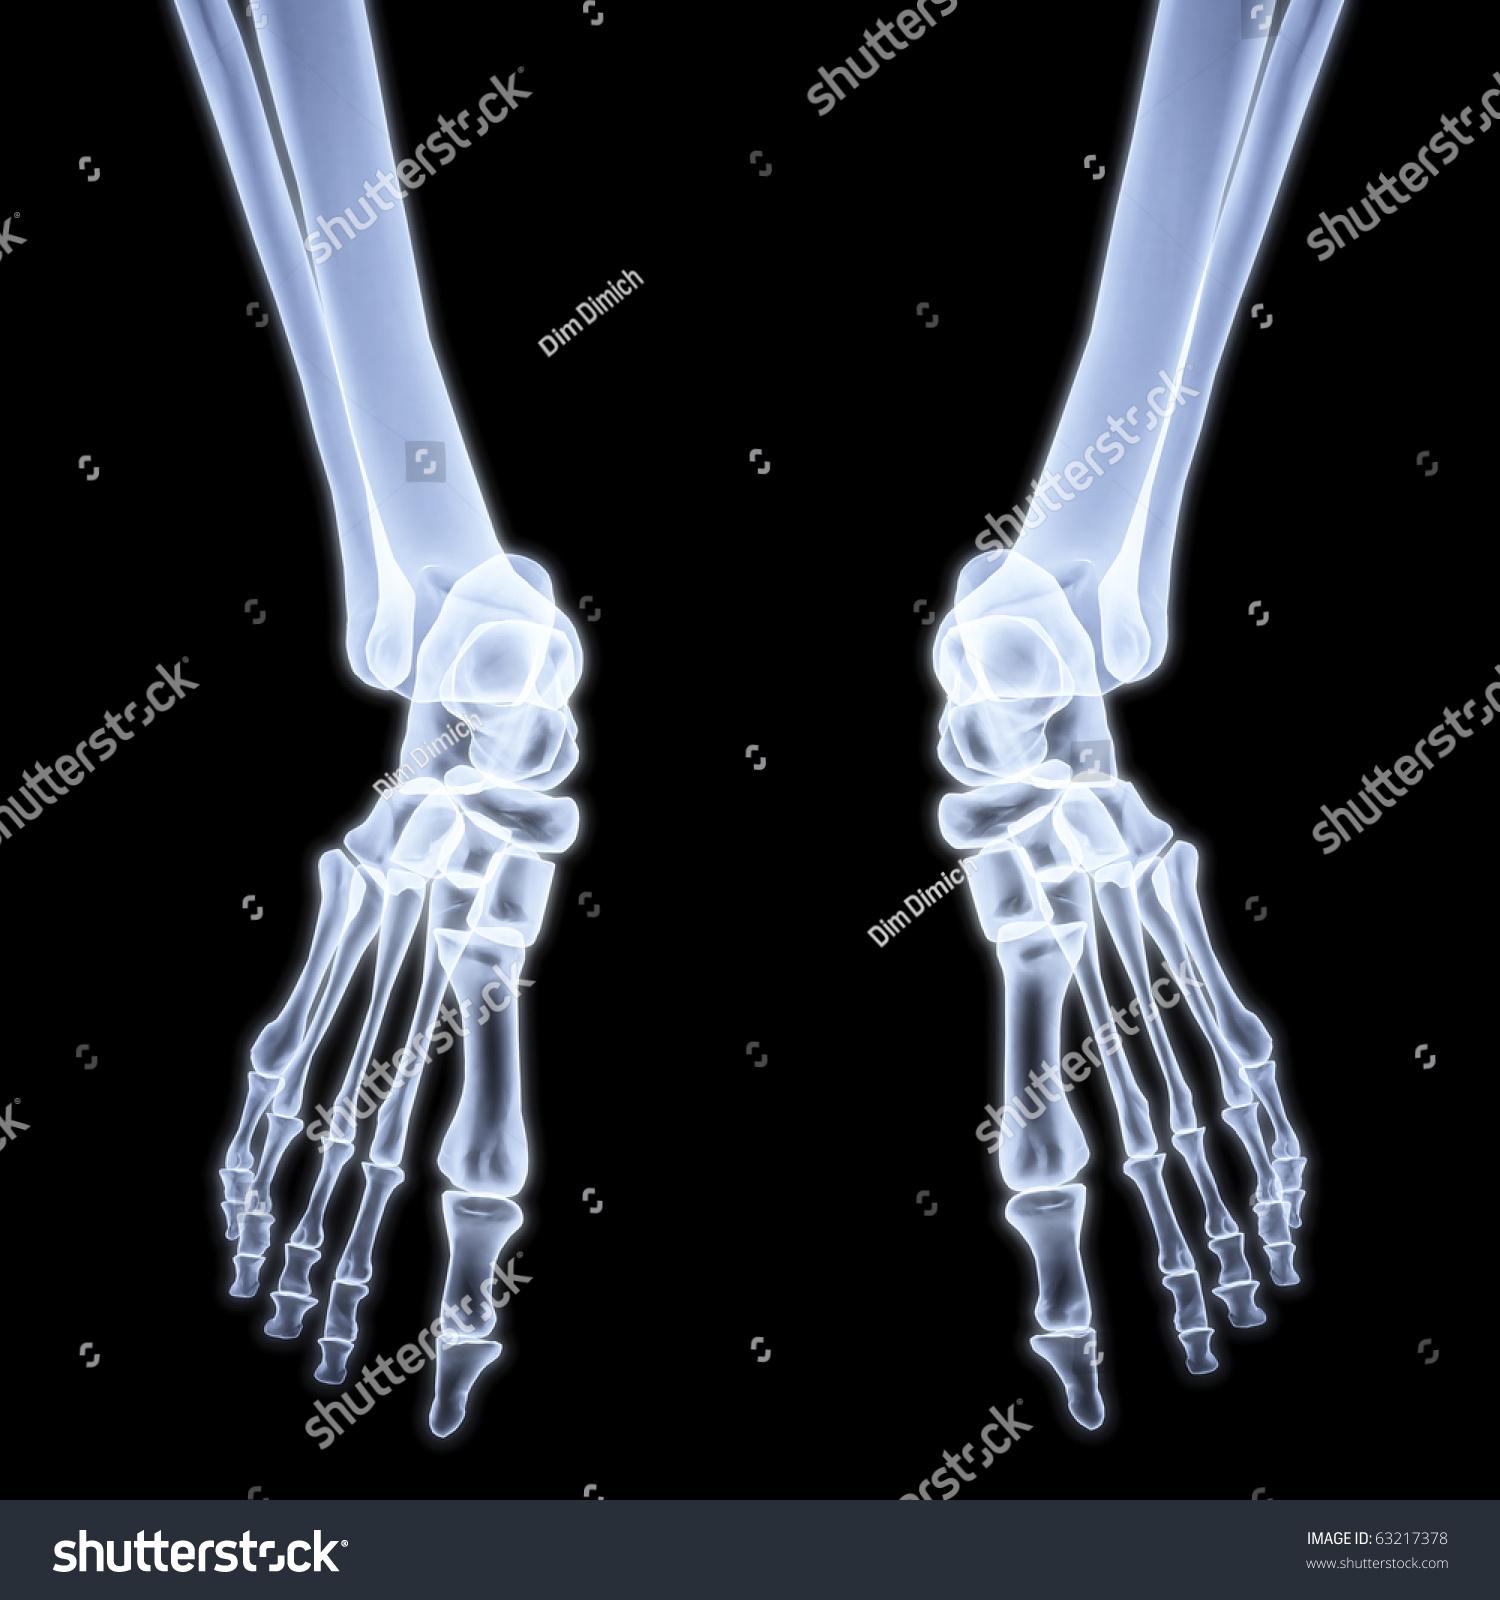 Human Legs Under X-Rays. 3d Image. Stock Photo 63217378 : Shutterstock